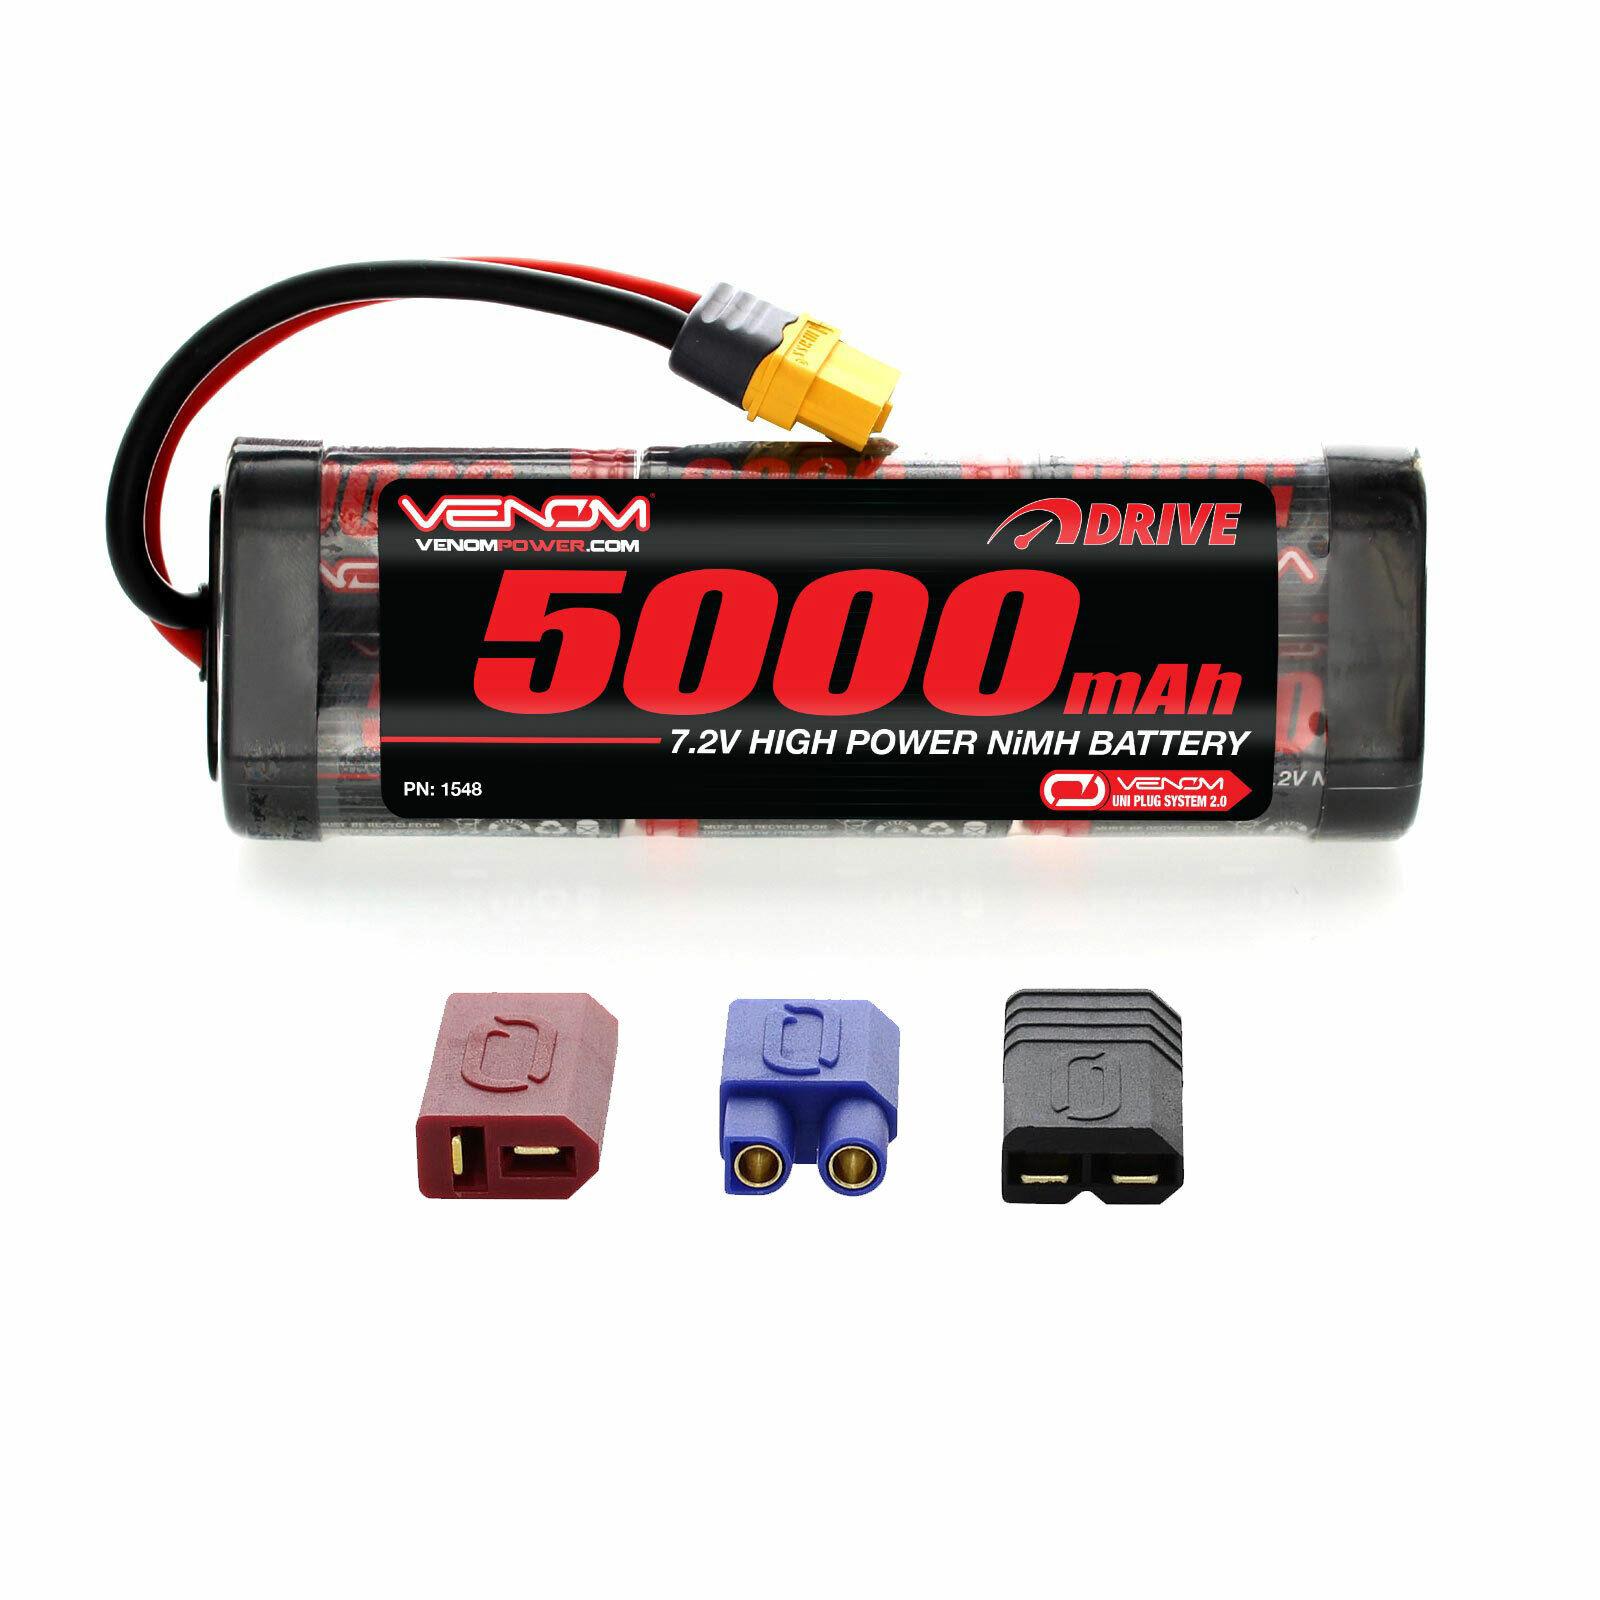 Axial SCX10 Jeep Wrangler Rubicon 7.2V 5000mAh NiMH Battery by Venom